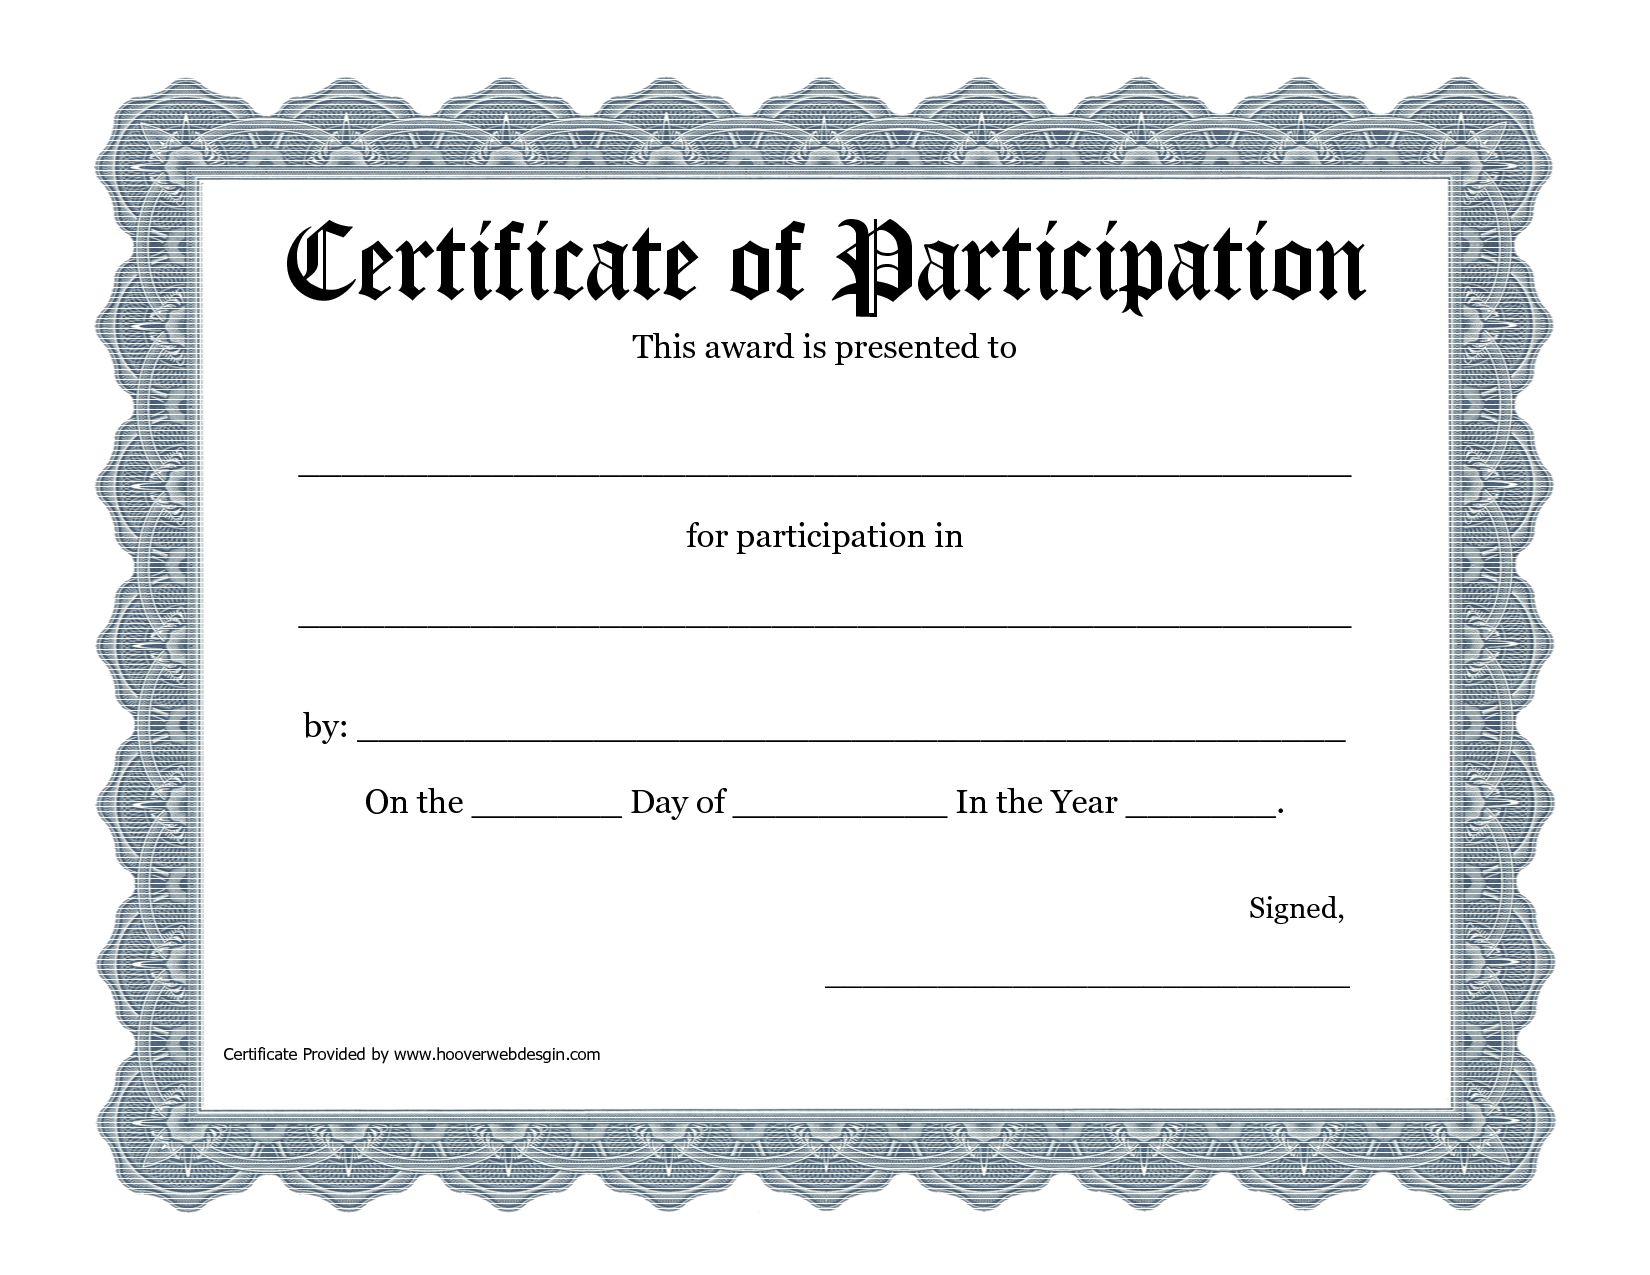 Free Printable Award Certificate Template - Bing Images | 2016 Art - Free Printable Honor Roll Certificates Kids